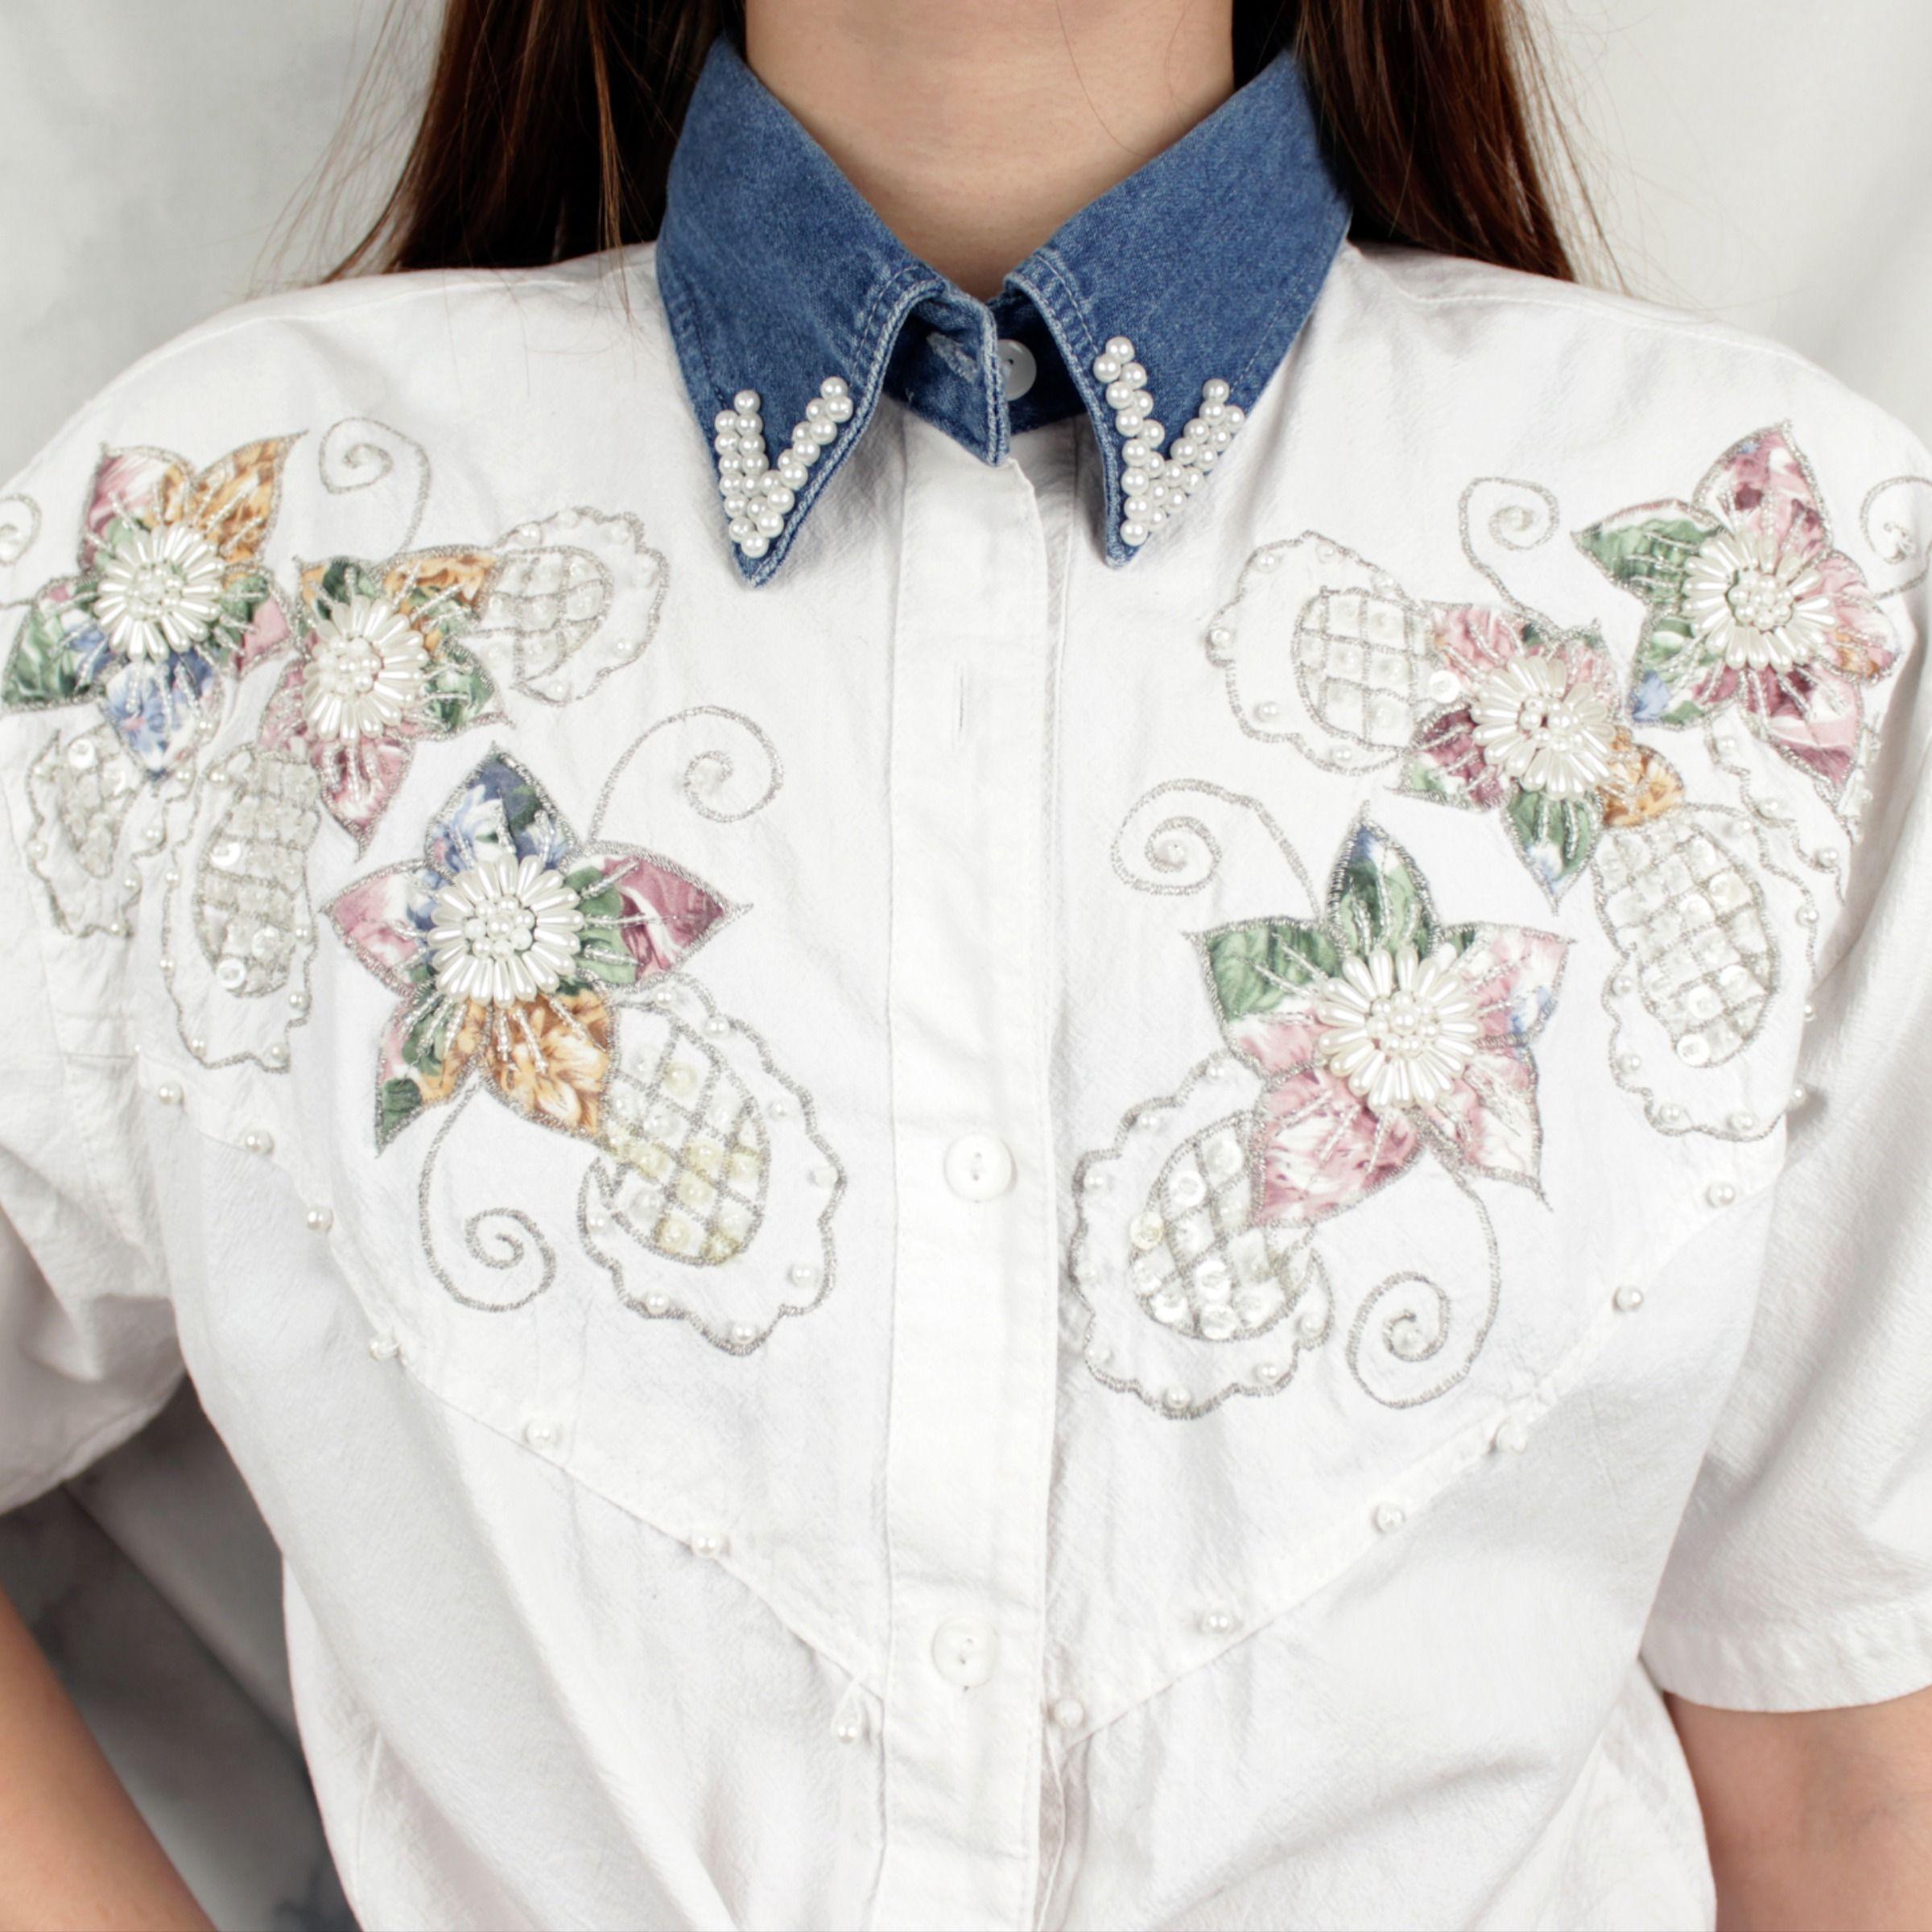 Vintage 80s Beaded Embroidered Collared Shirt Retro White Embellished Cowboy Western Unisex Short Sleeve Shirt Beaded Shirt Beaded Beaded Top